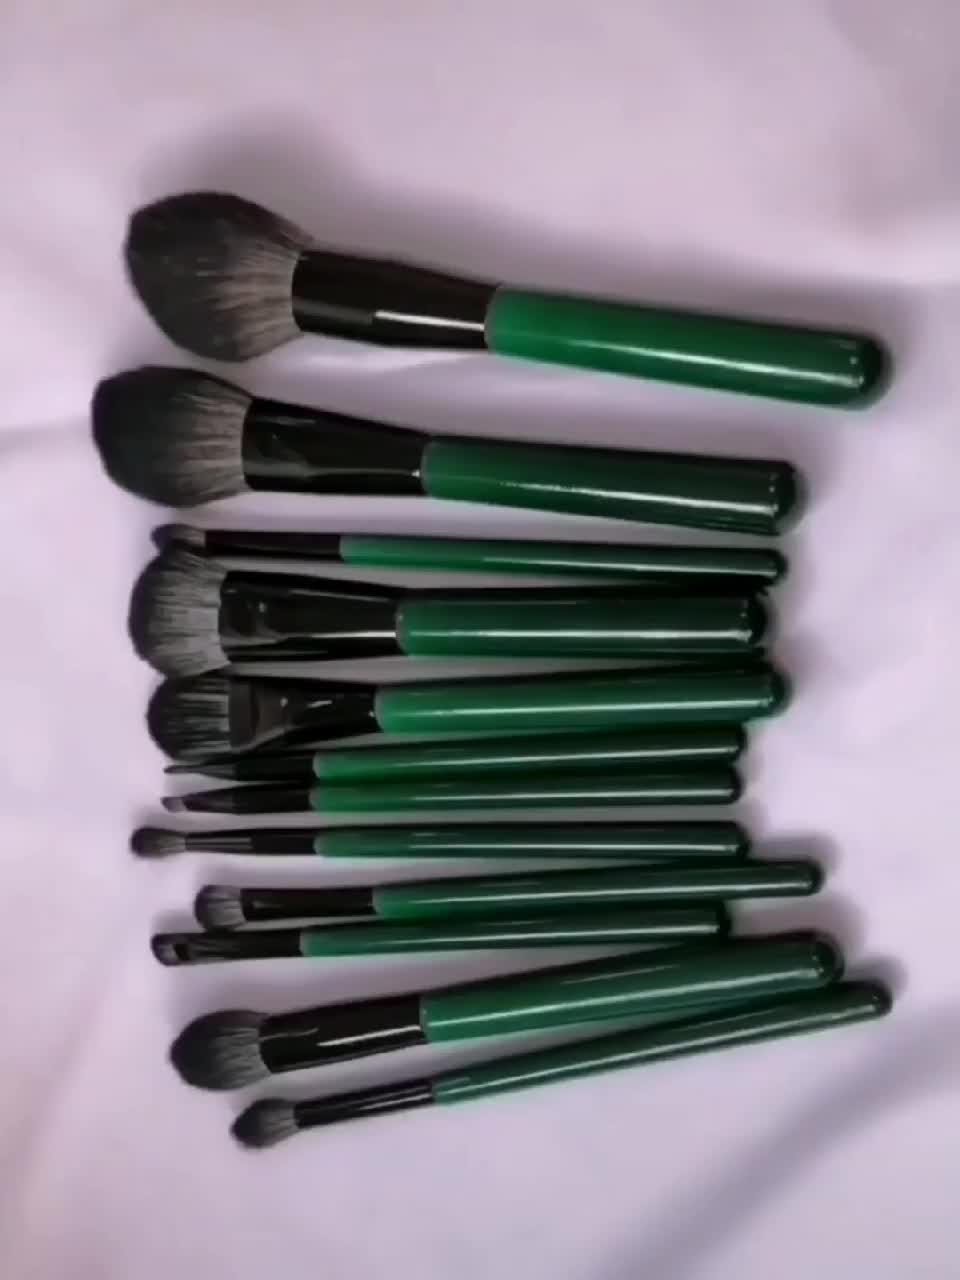 2020 neue! 12pcs Profi Powder Foundation lidschatten grün Make-Up Pinsel Kosmetik Synthetische Haar make-up pinsel set